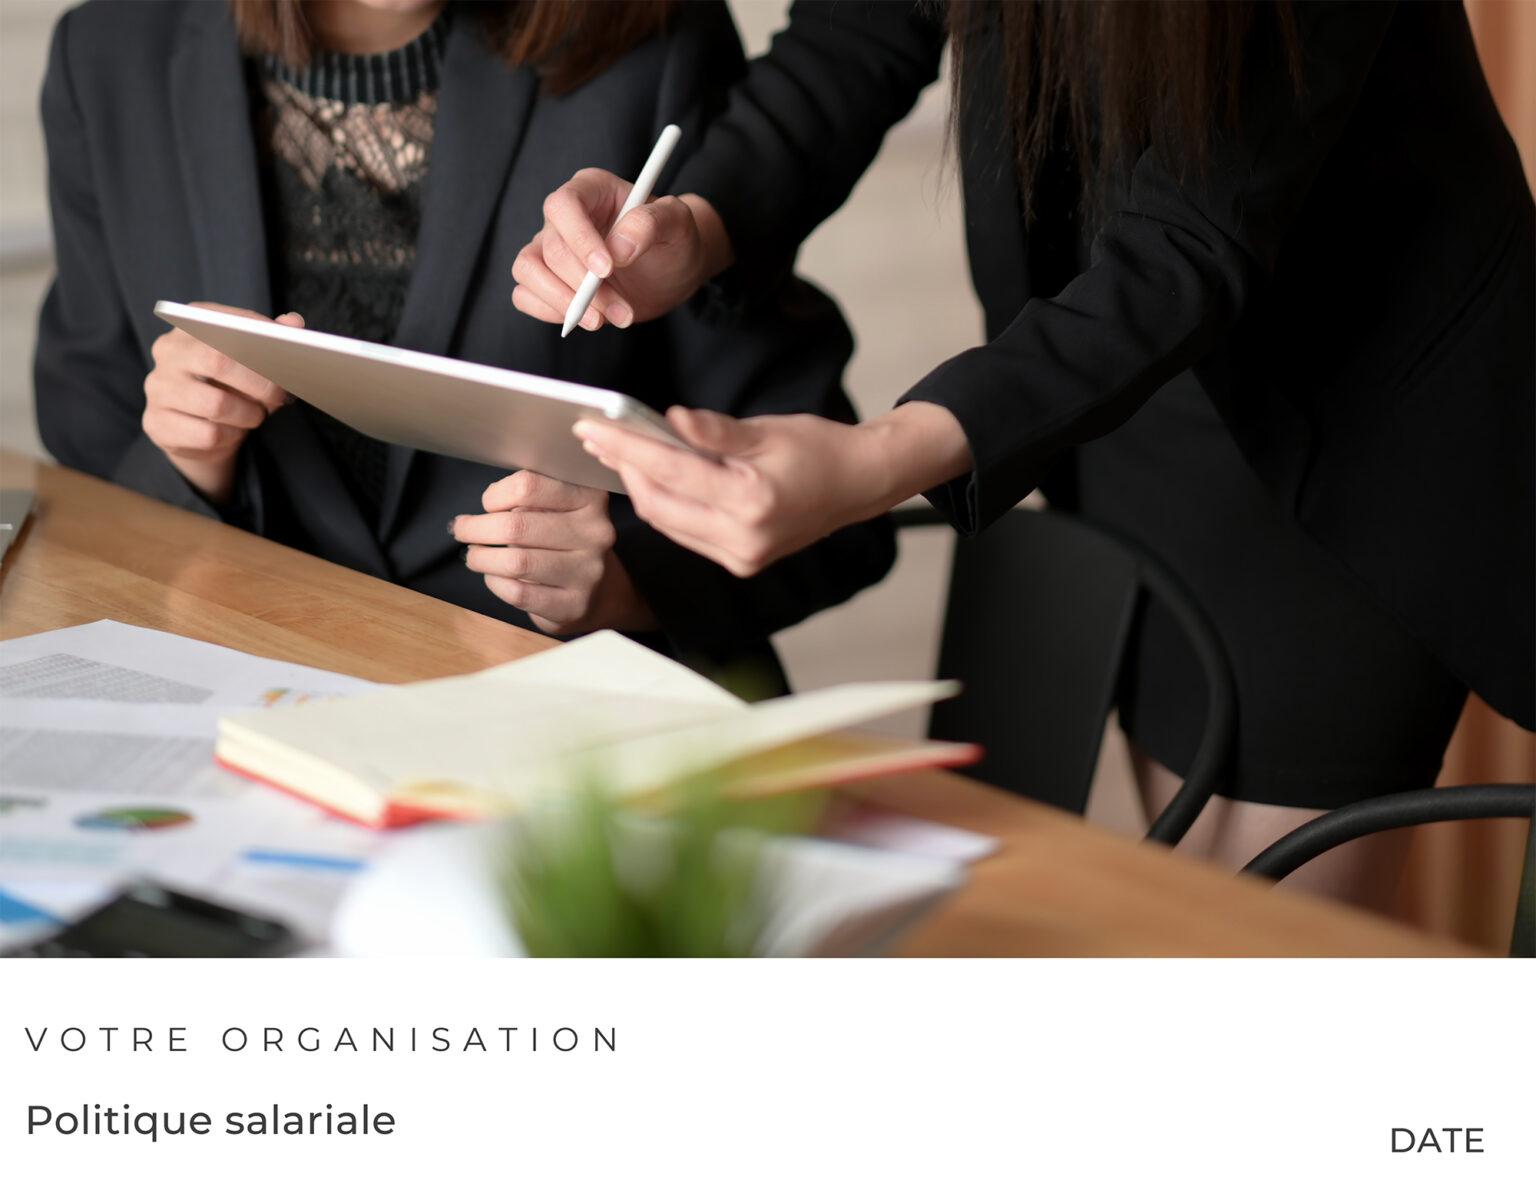 support-politique-salariale-talentbox-remuneration-quebec